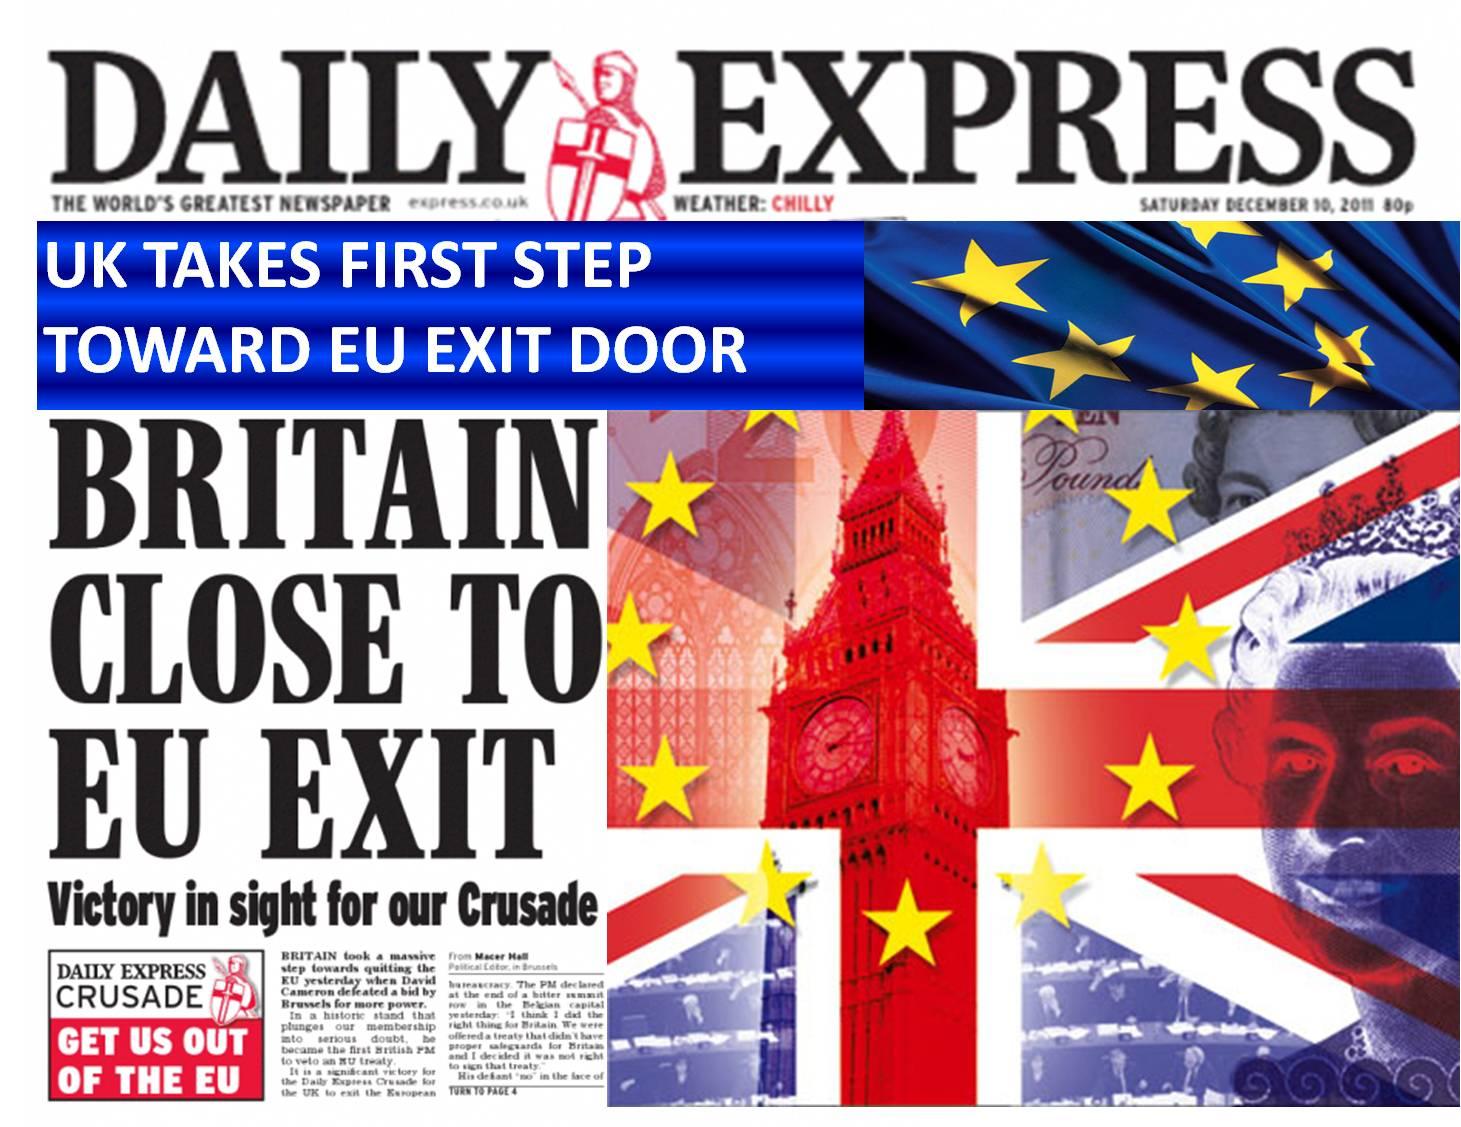 Despite all political commentators saying it wouldn't happen, BREXIT has happened